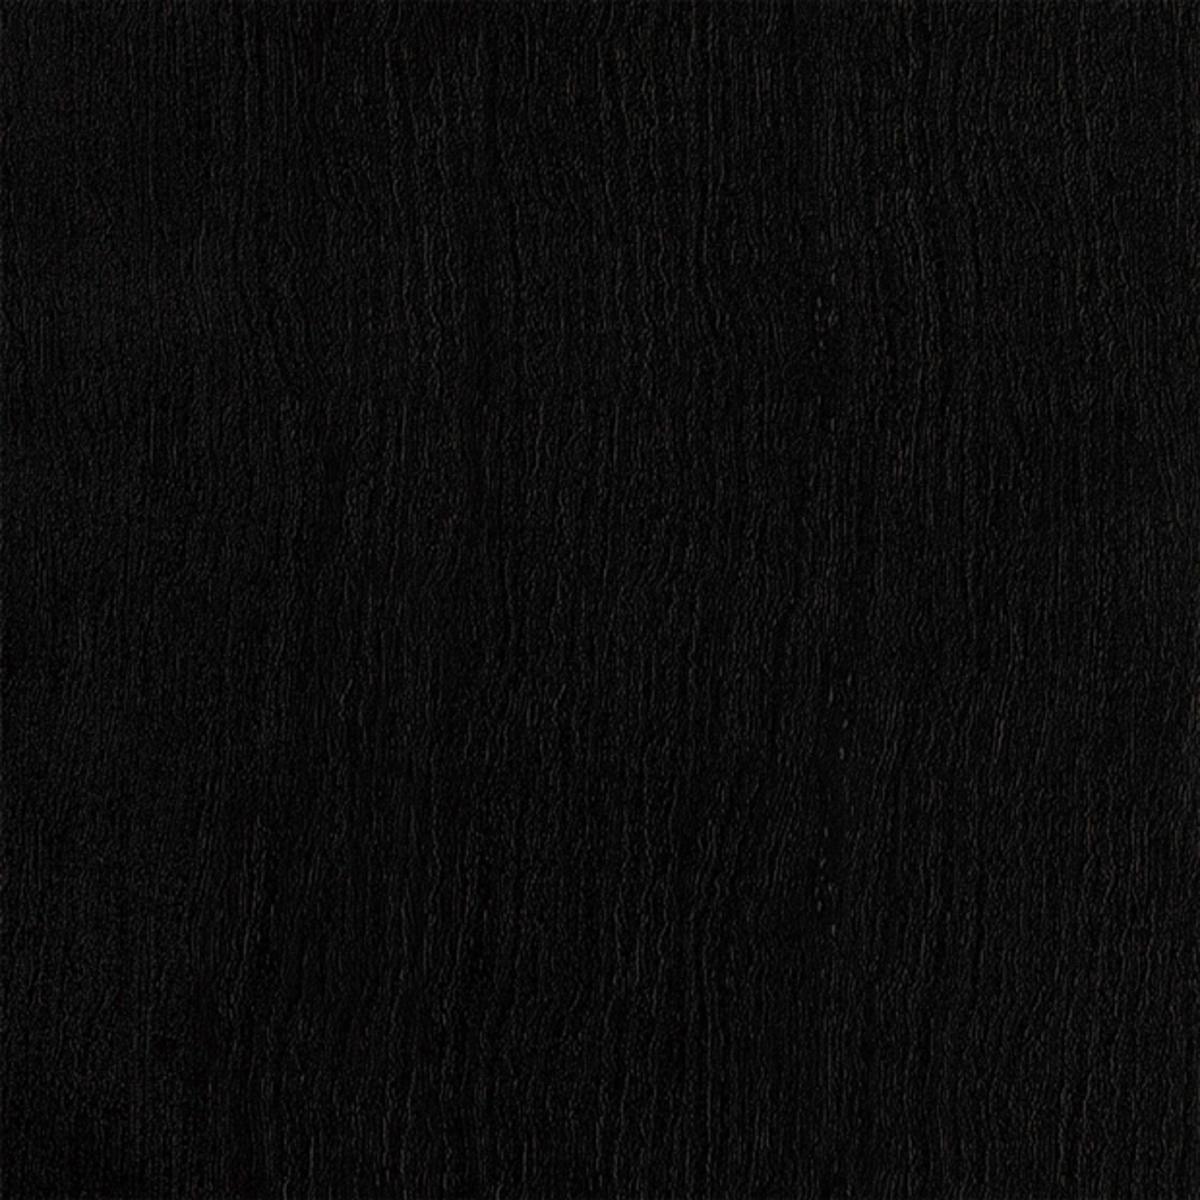 Tiles - MUNICH - Textured (Linear) Black 300x600mm (8 pieces)